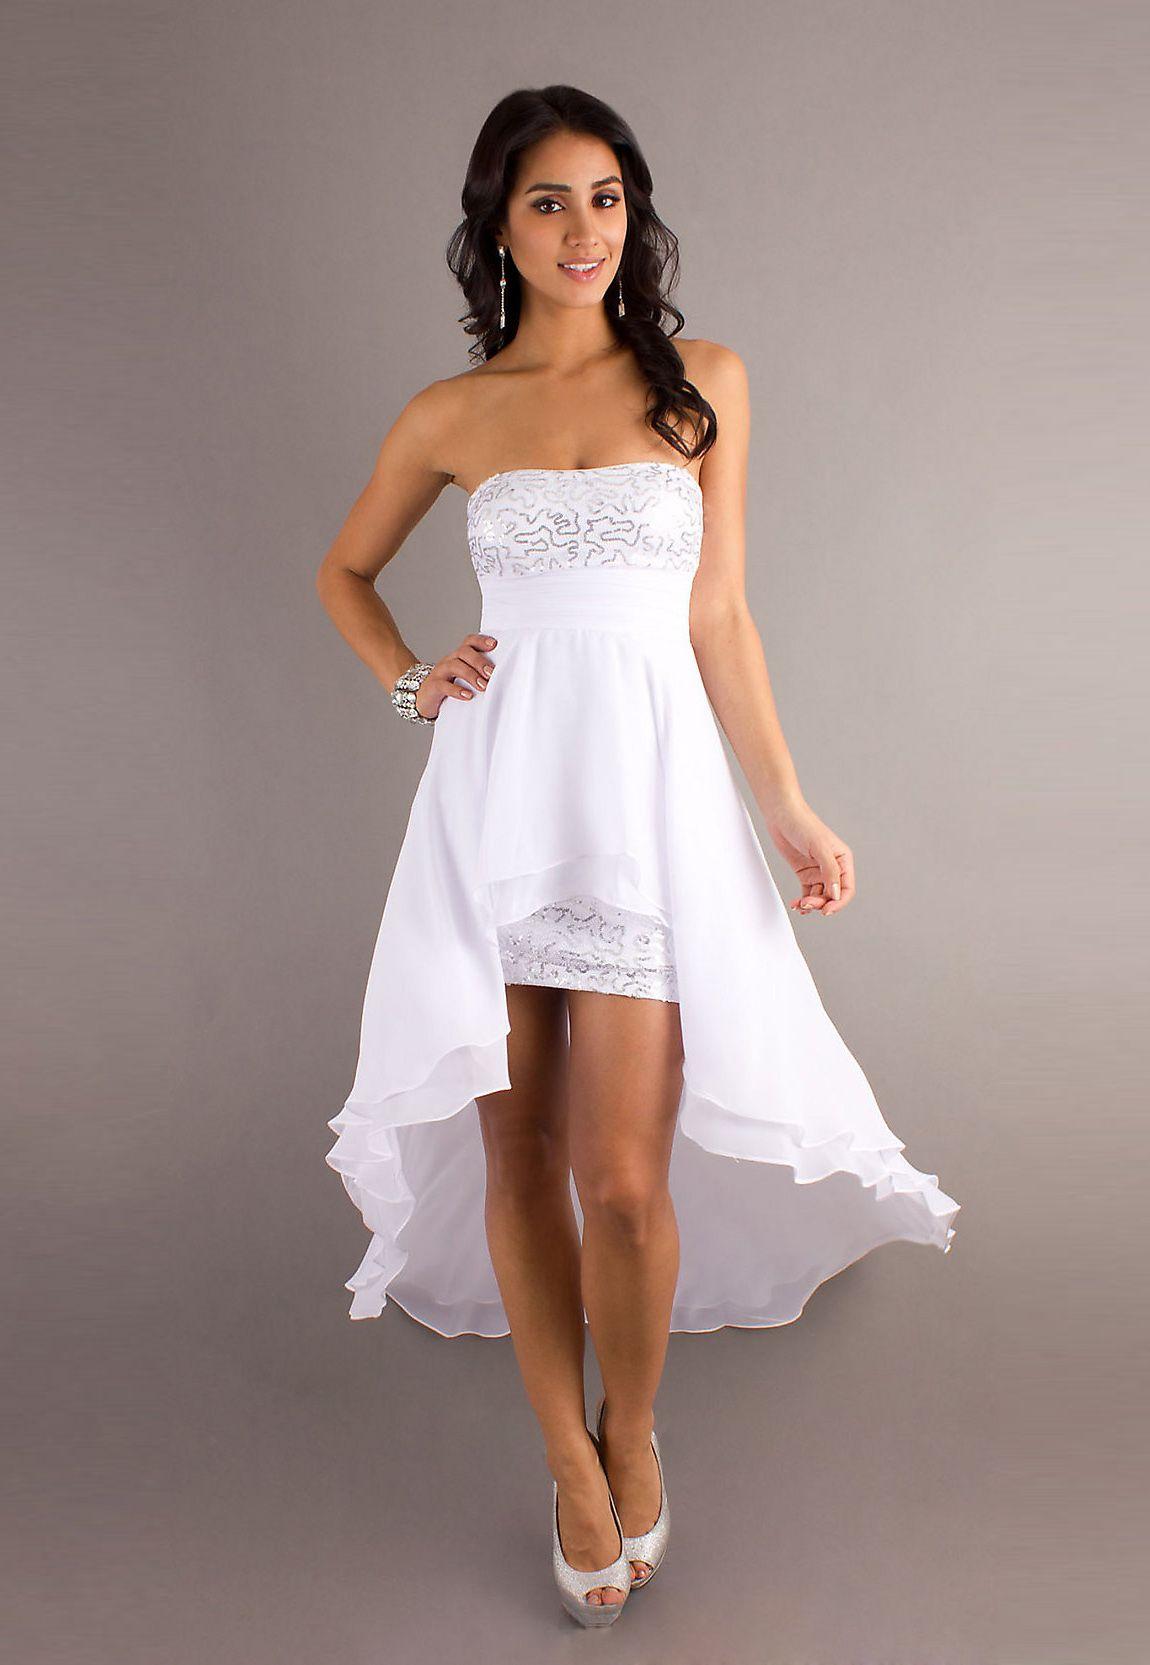 1000  images about Wedding Dress Ideas on Pinterest - Halter ...